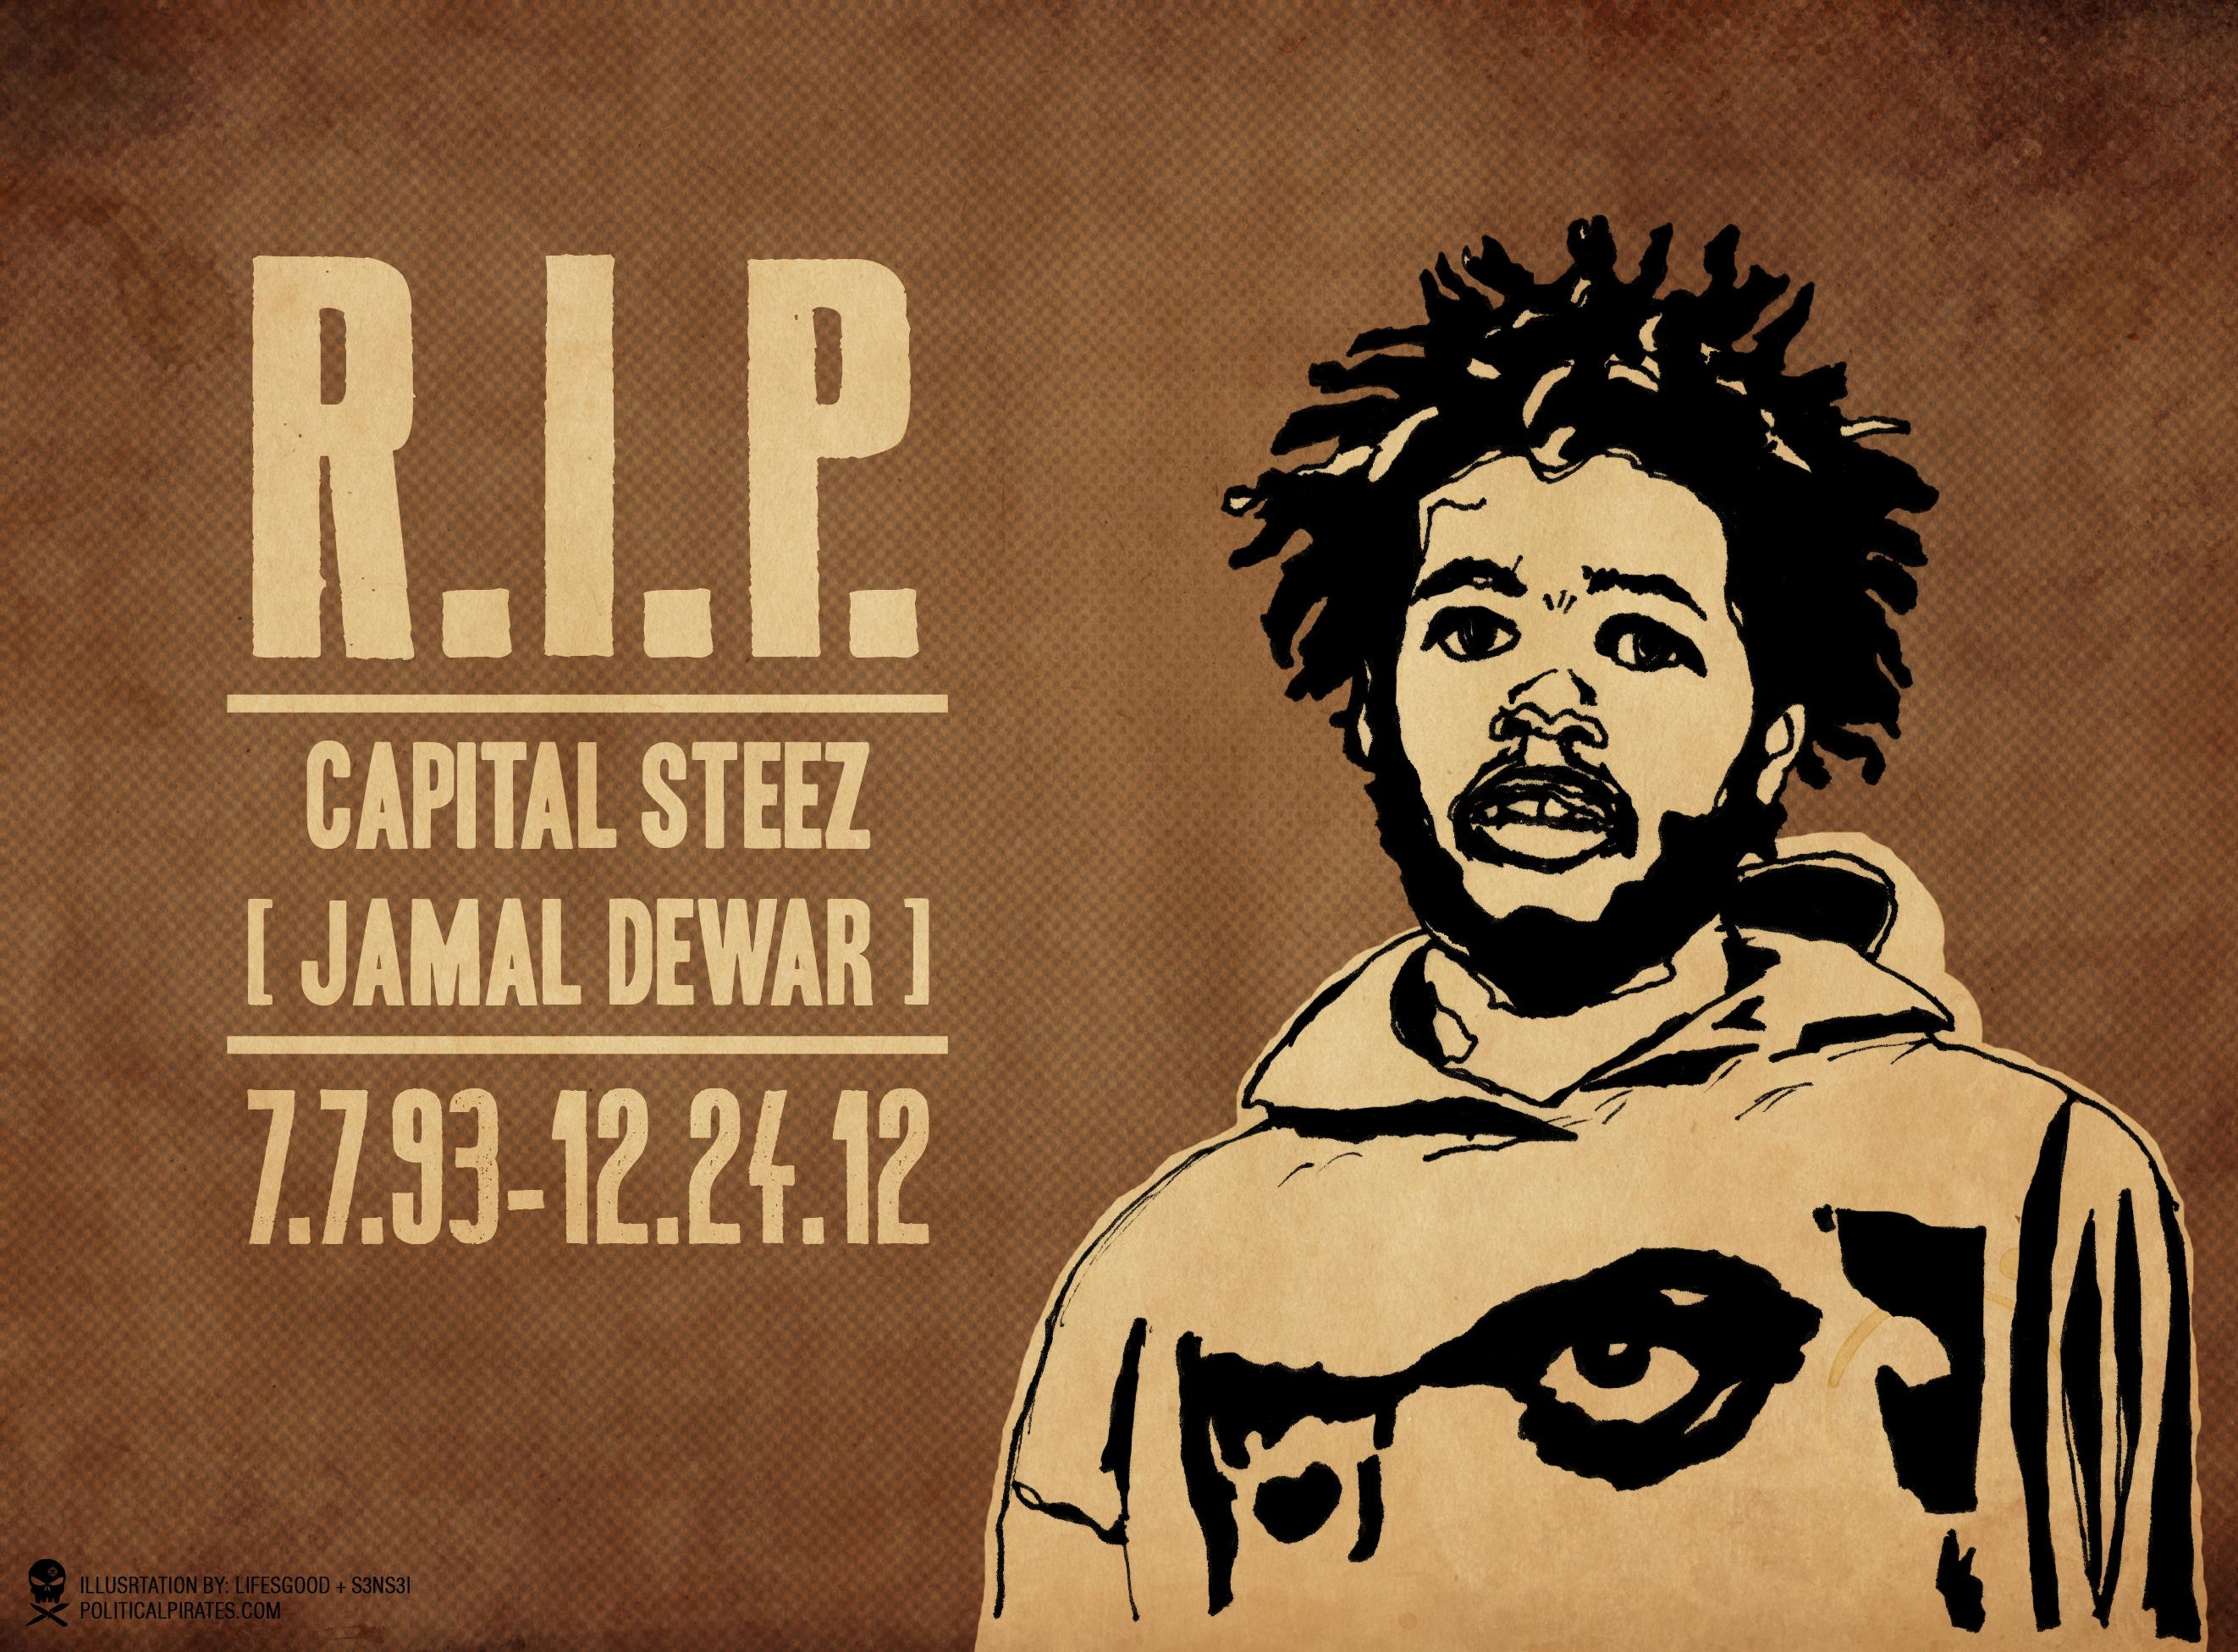 Capital Steez